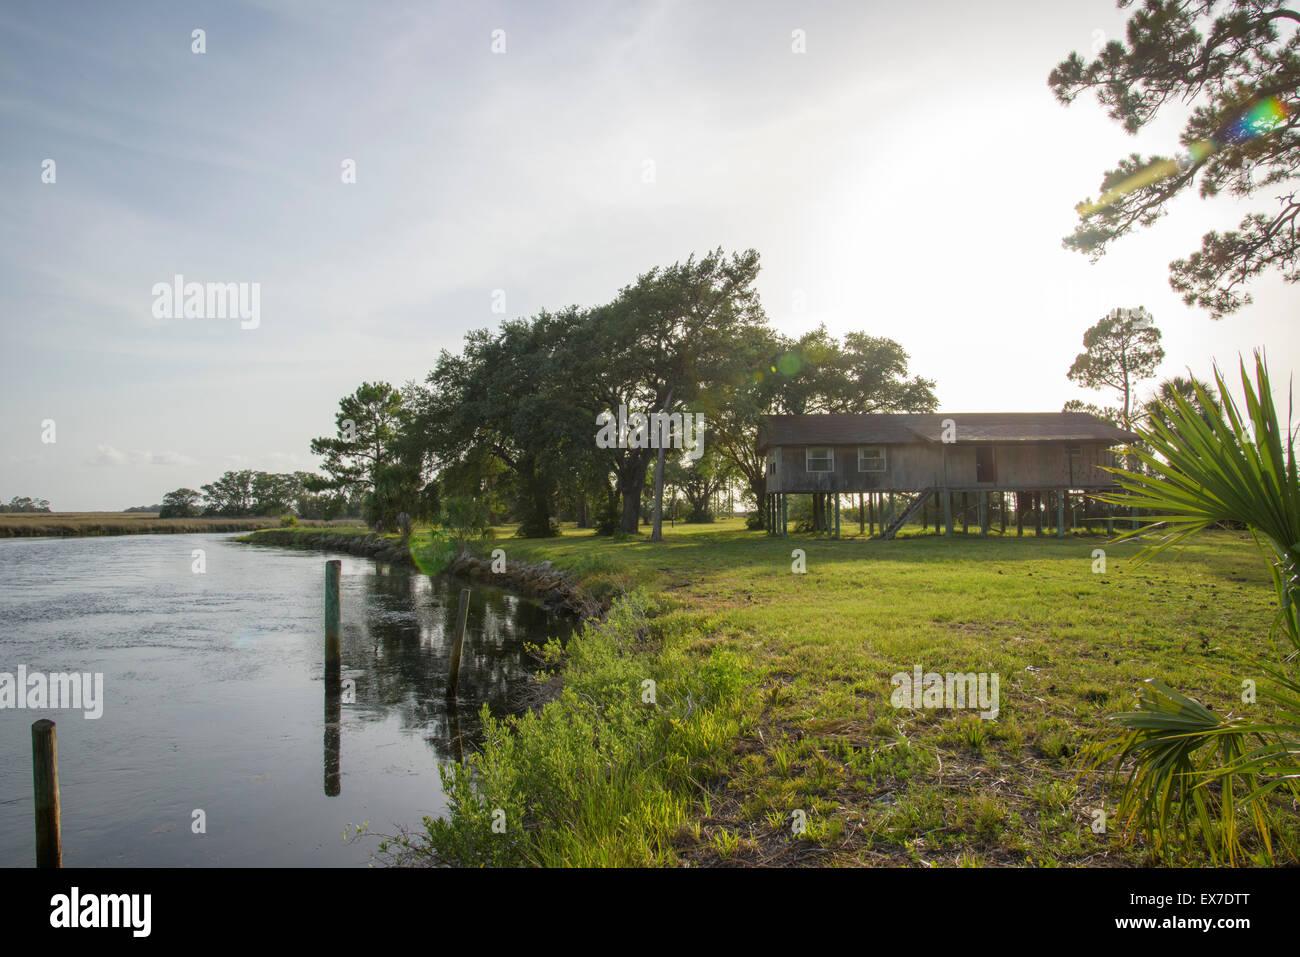 Cabin on Fish Creek, at Gulf of Mexico. Big Bend Seagrasses Aquatic Preserve, Florida - Stock Image